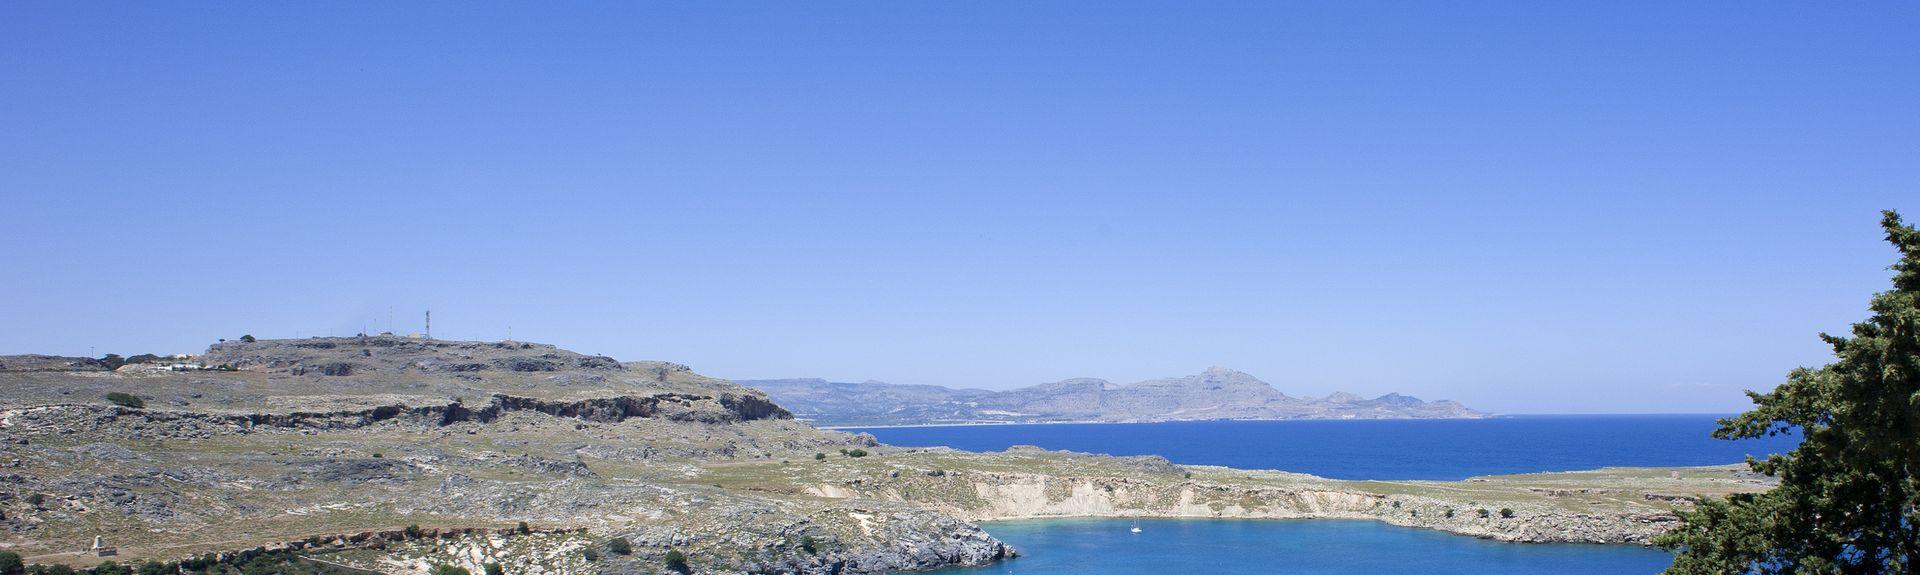 Gennadi, Egeanmeren saaret, Kreikka